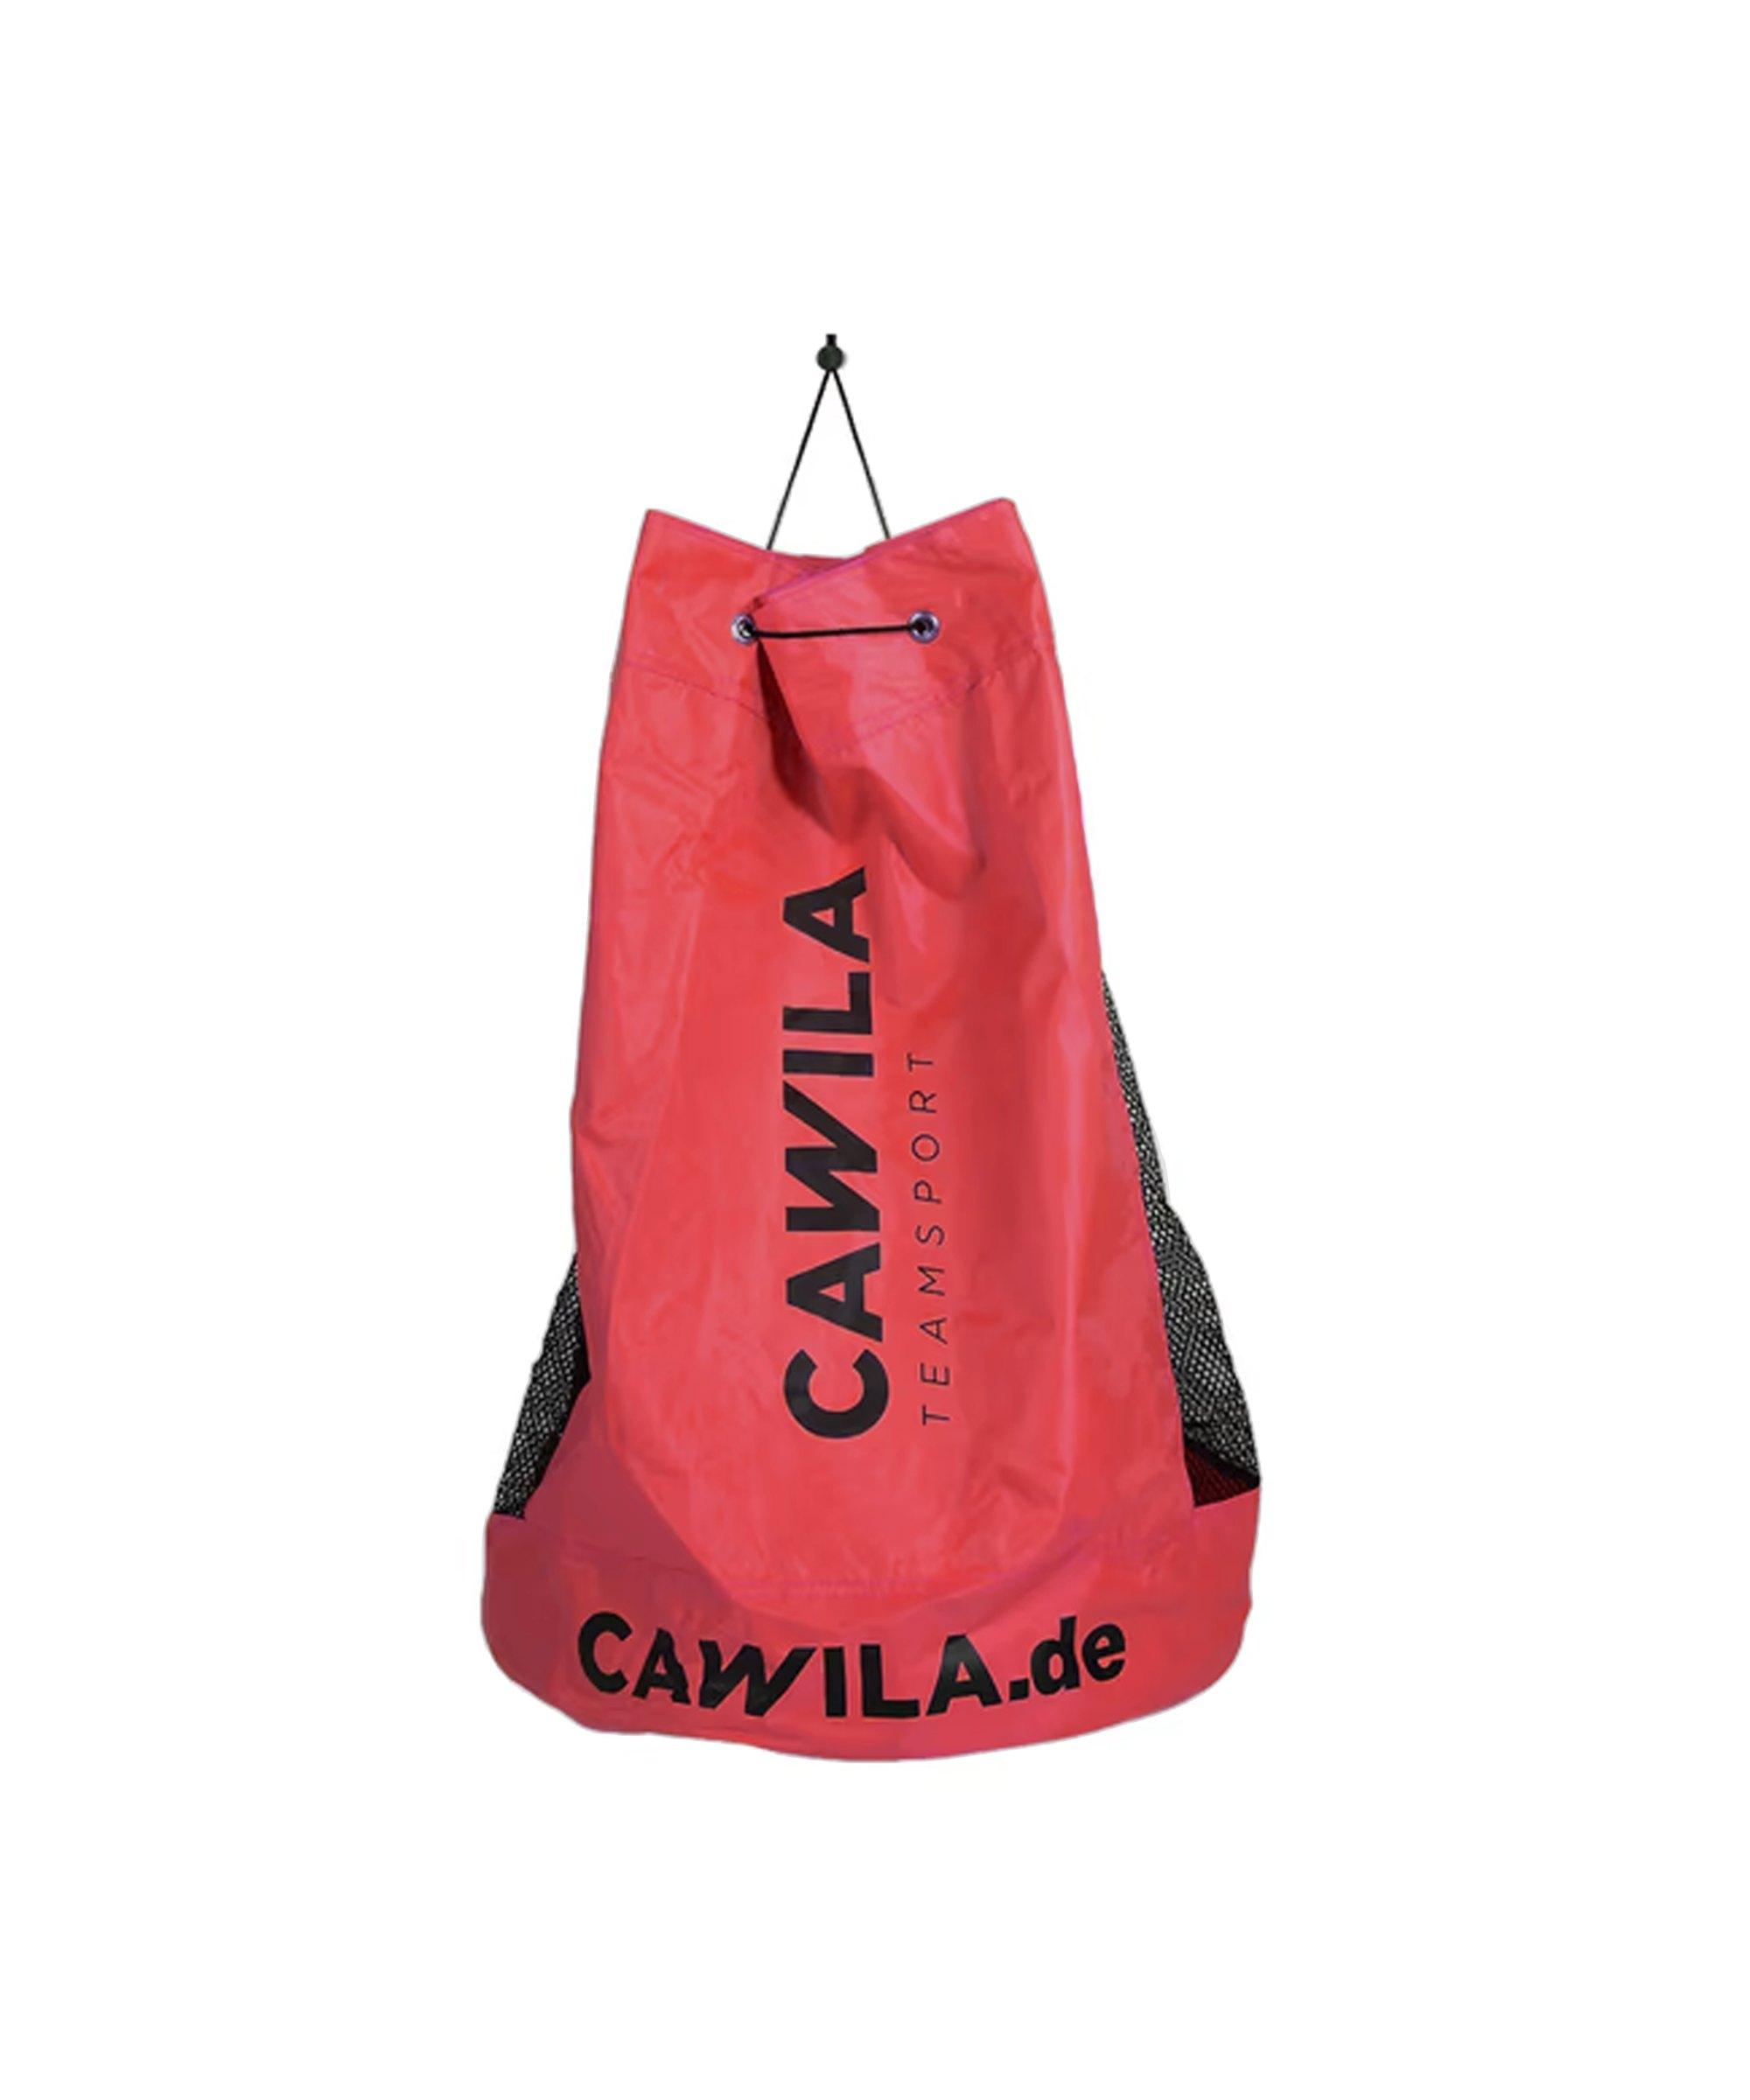 Cawila Ballsack 12 Fussbälle Rot - rot